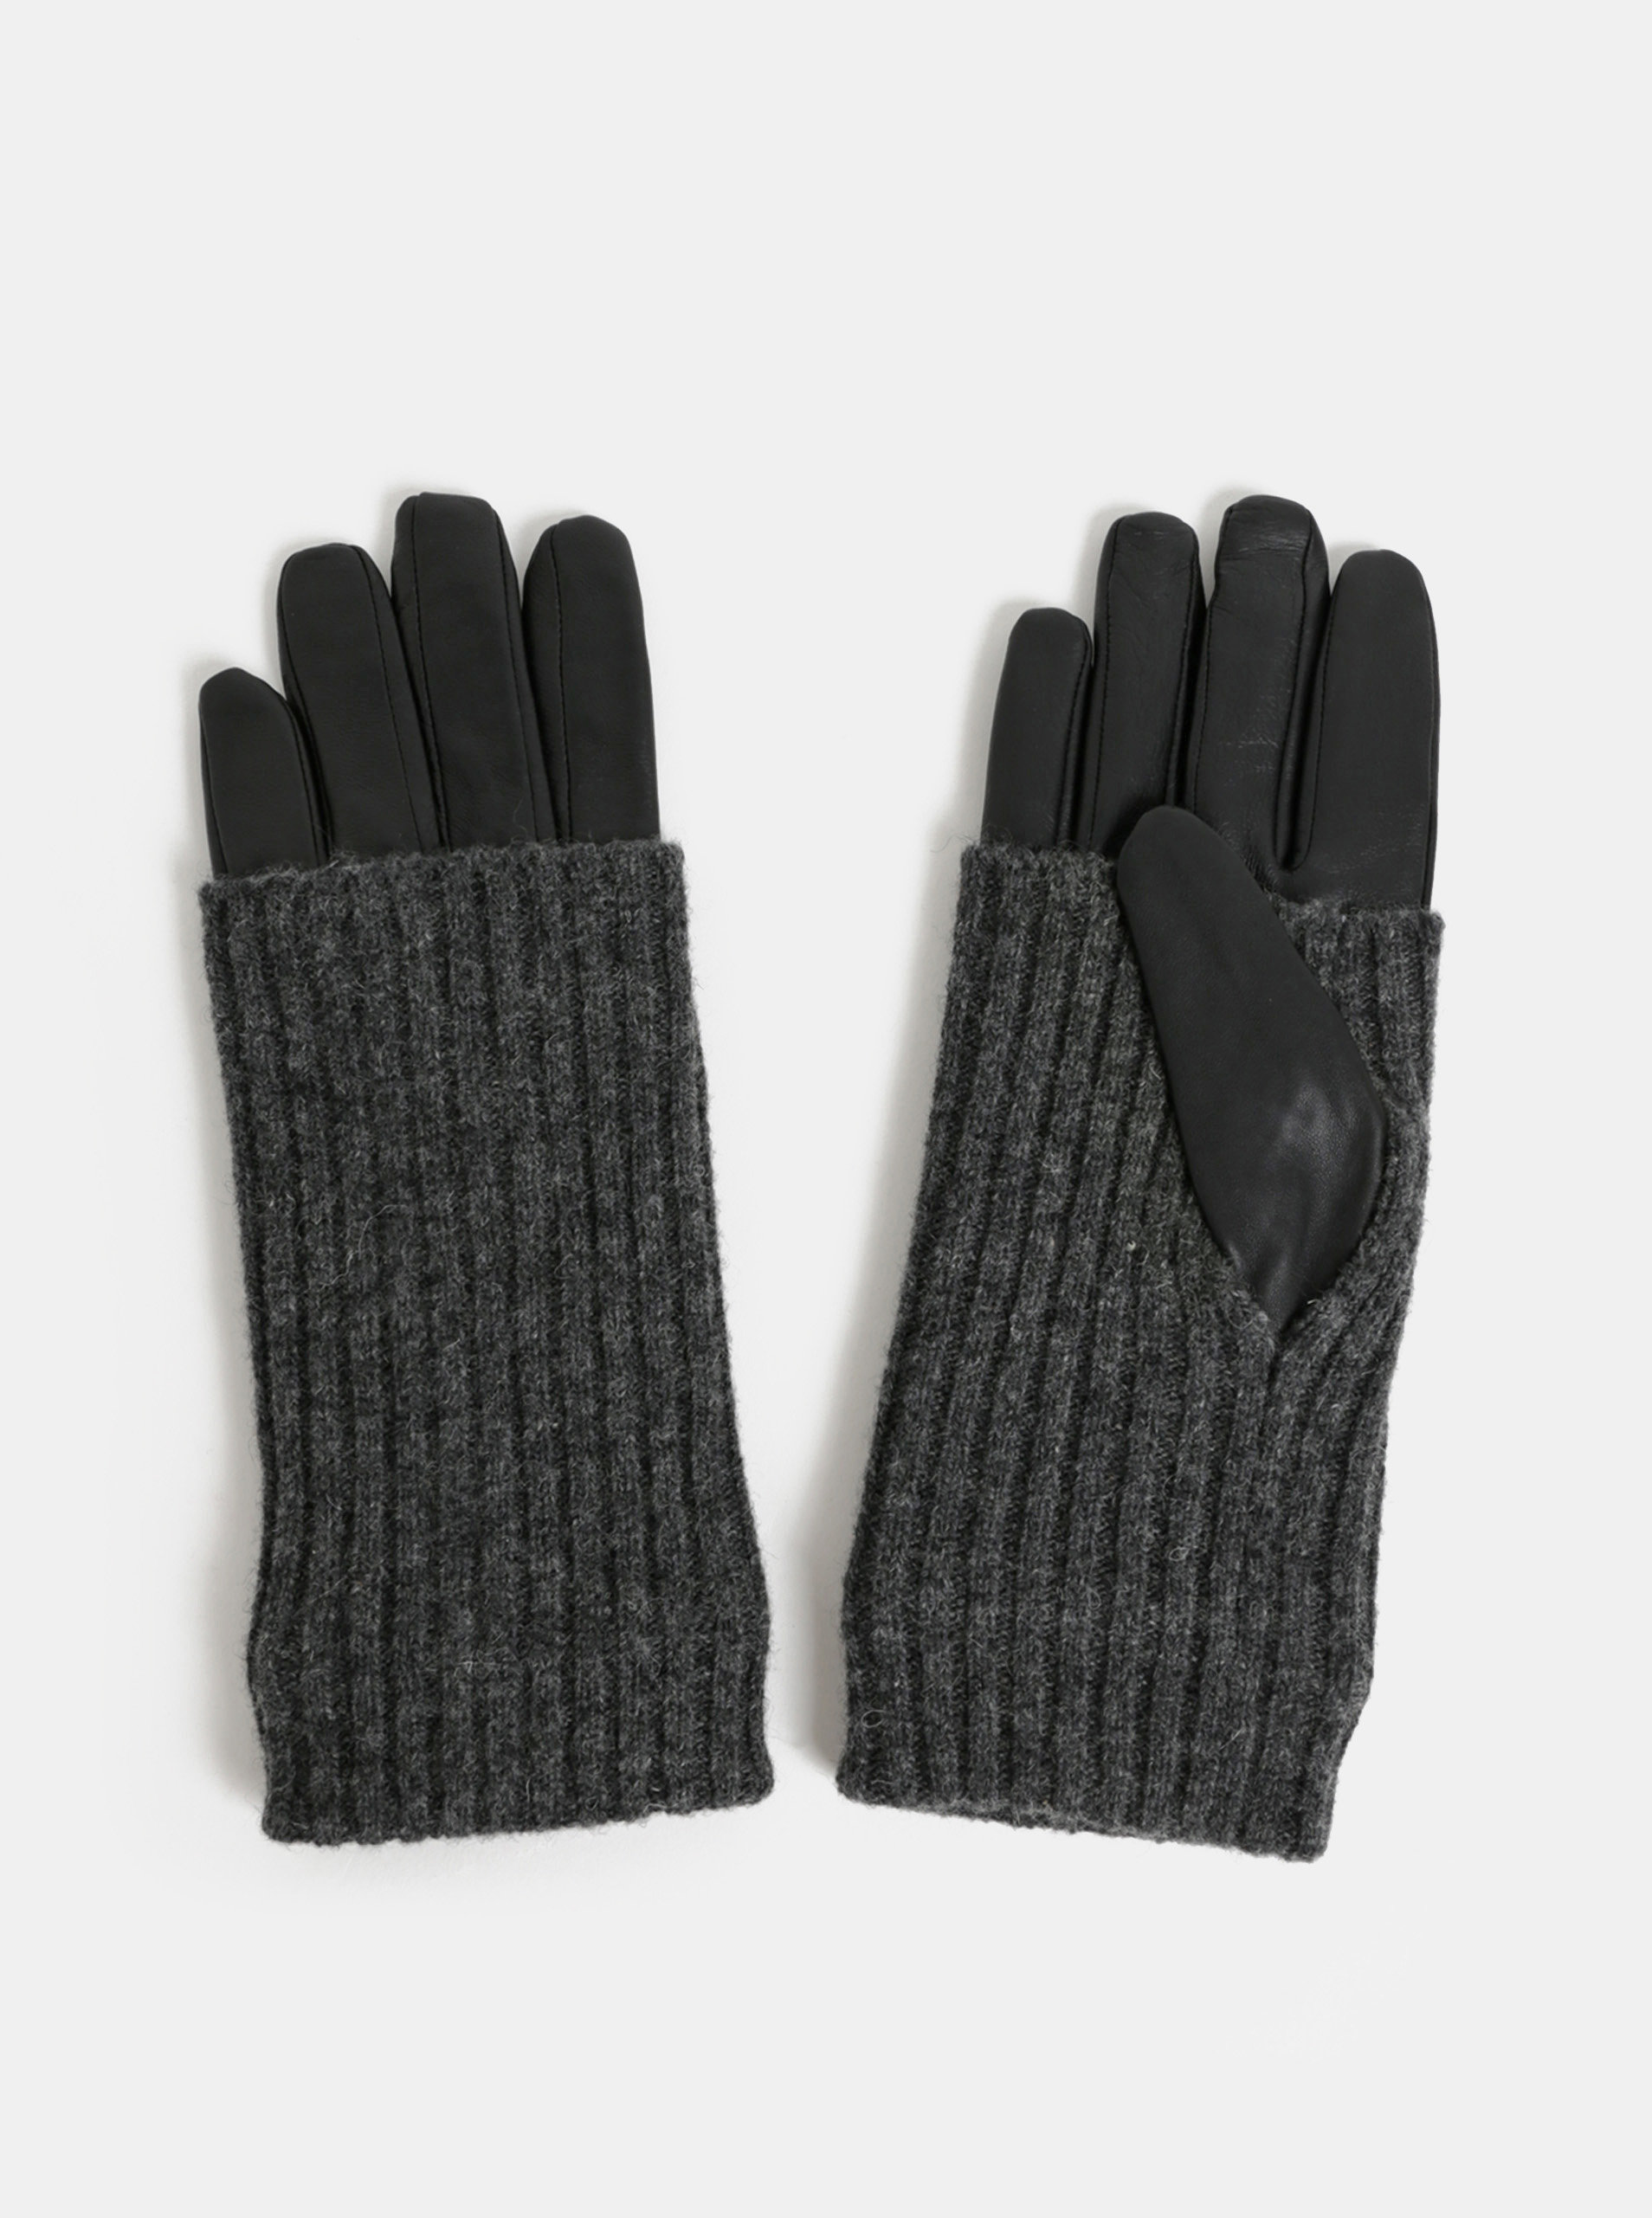 Černé kožené rukavice s ohrnovacím vlněným úpletem VERO MODA Mie